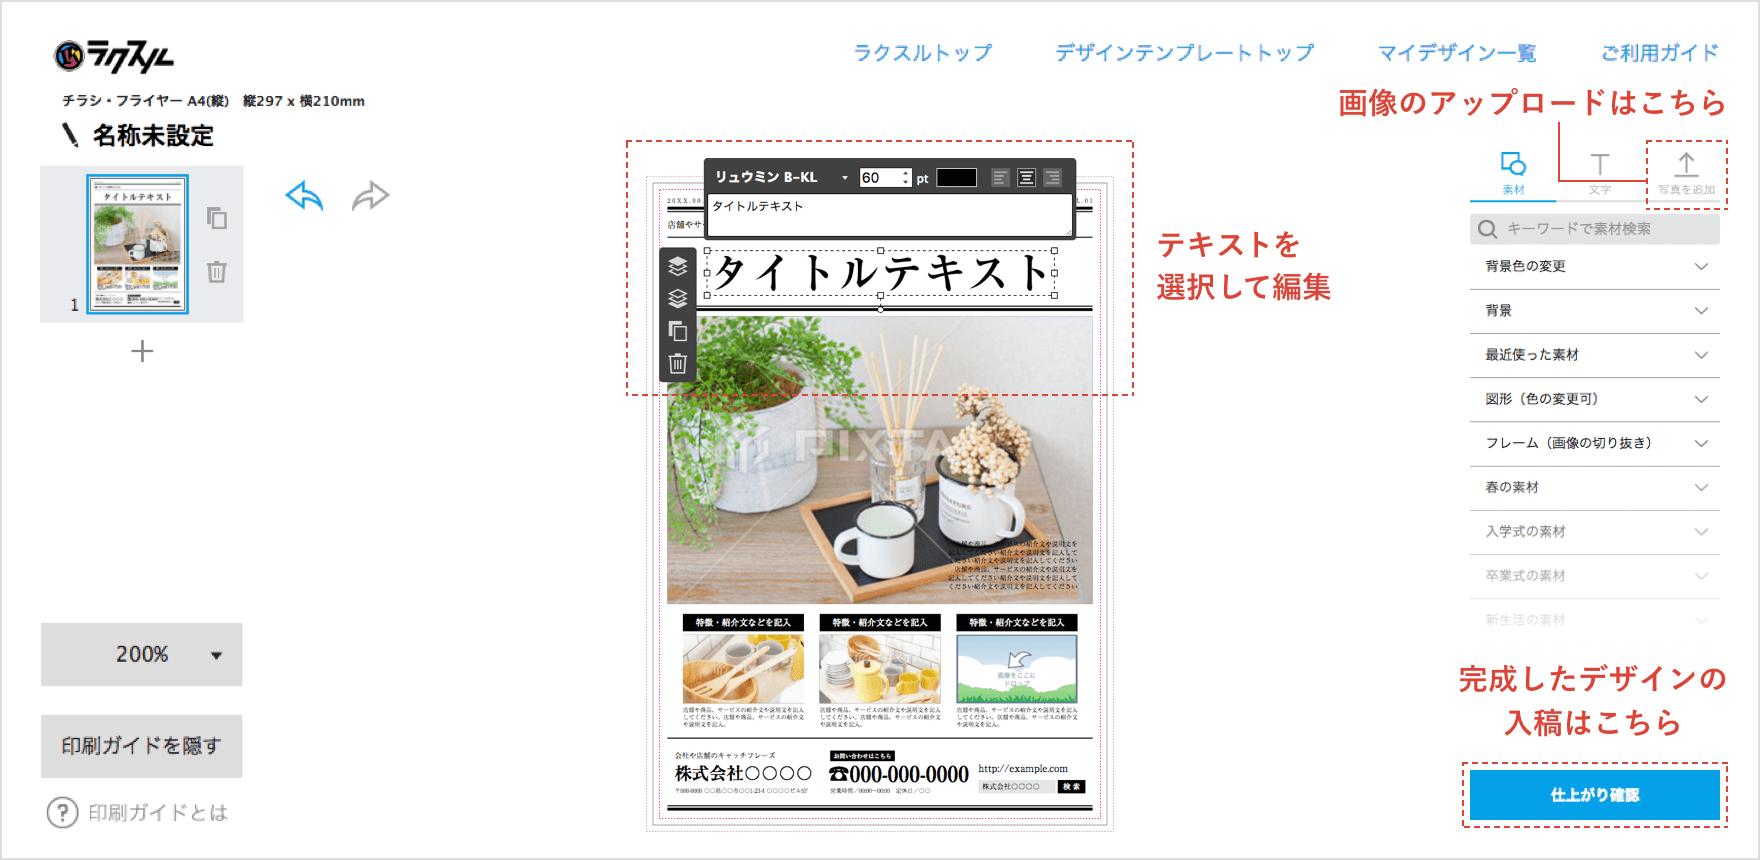 【STEP2】写真素材や店舗情報などを編集しよう